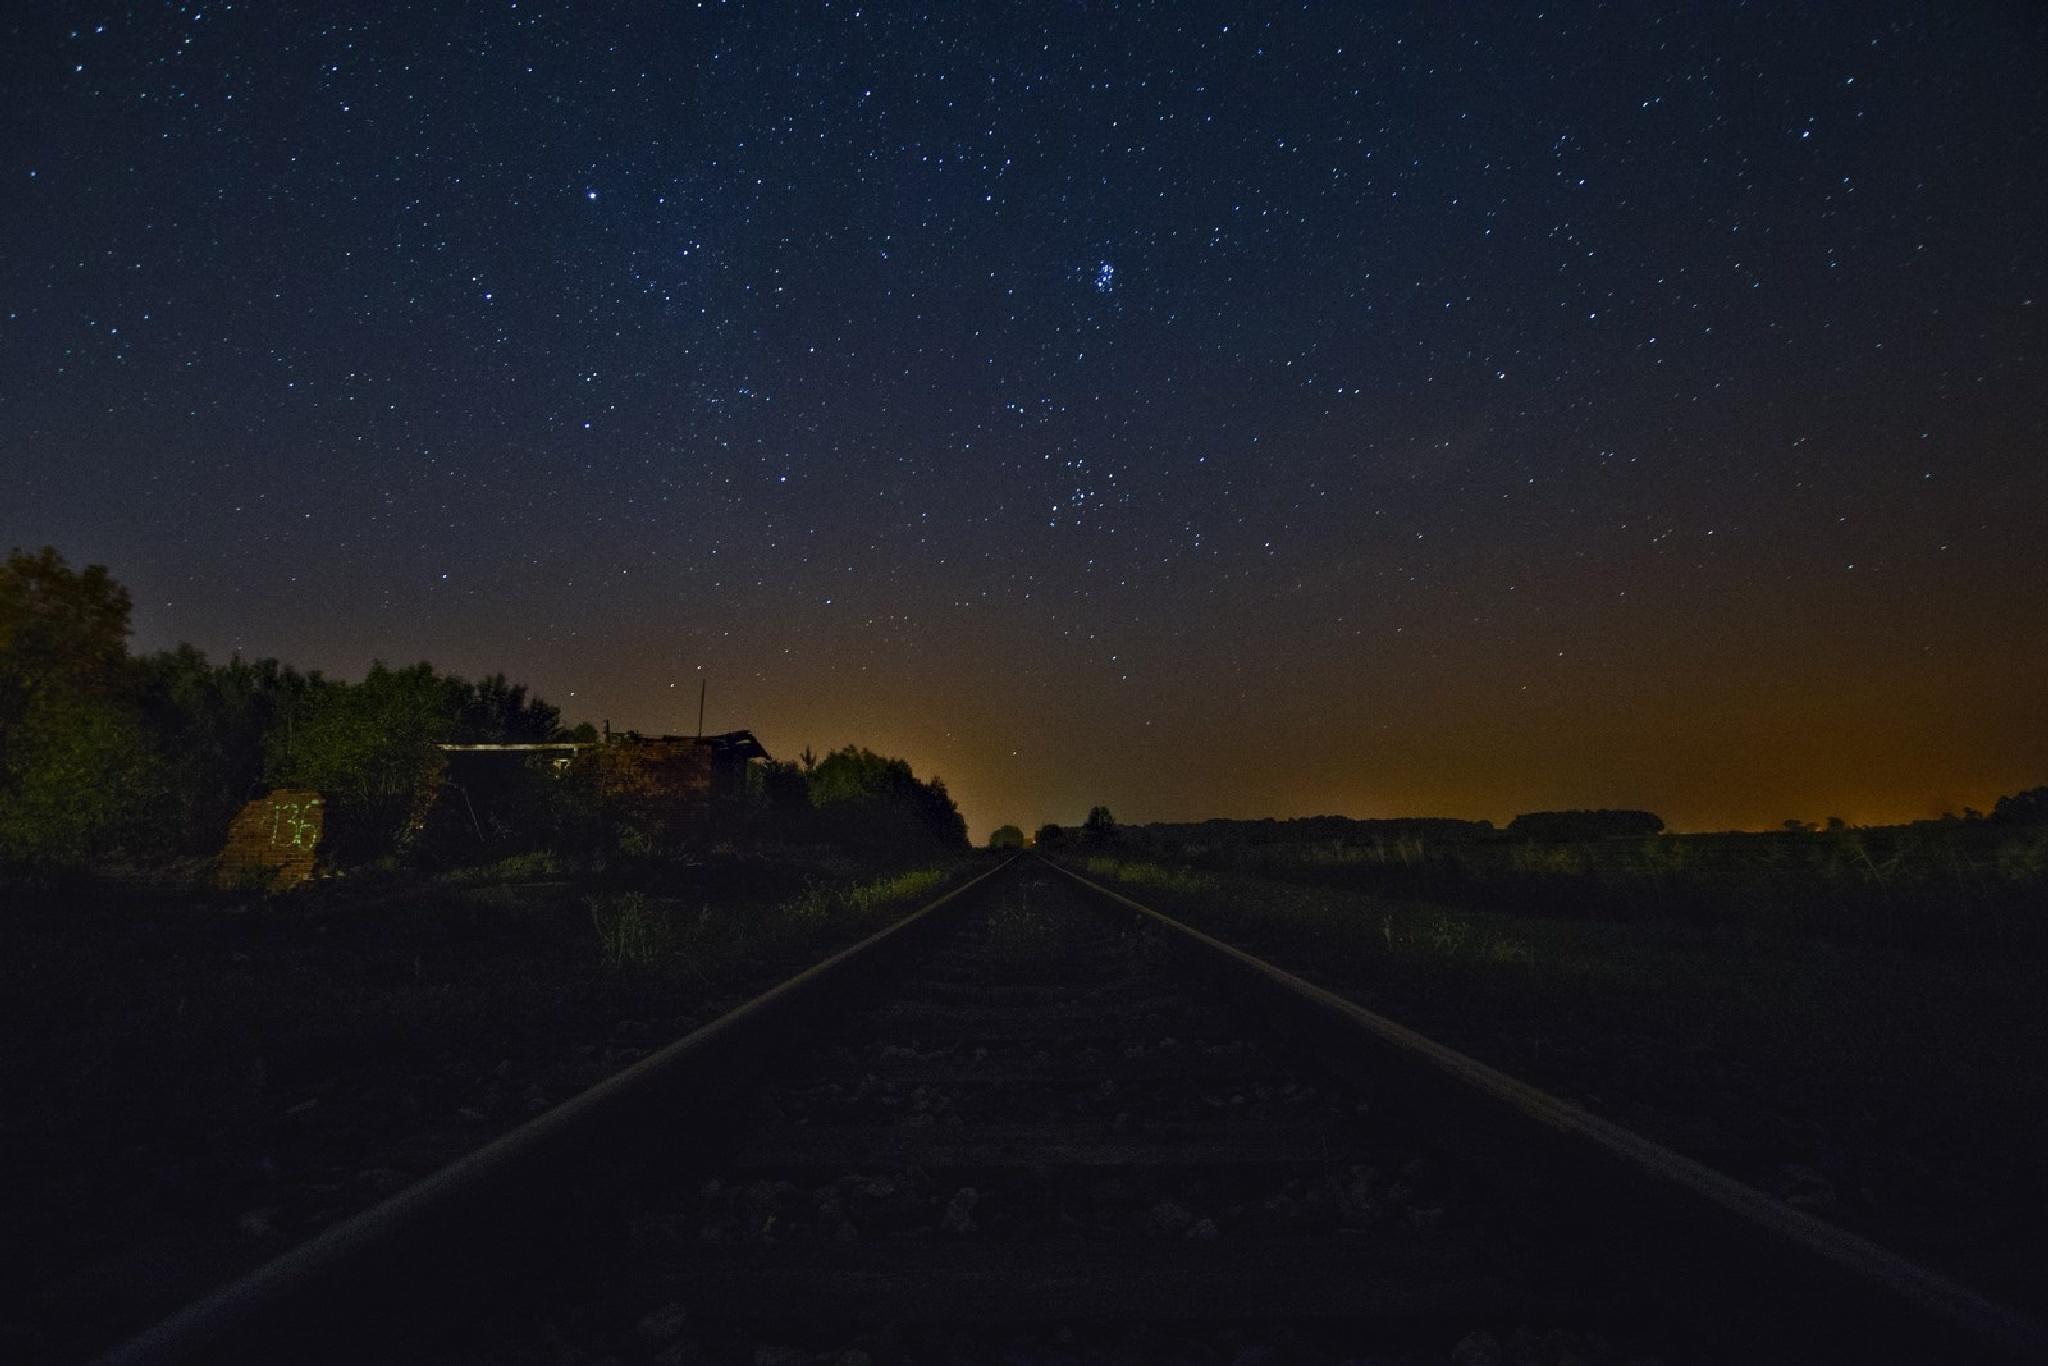 Night vision by Waldemar Sadlowski